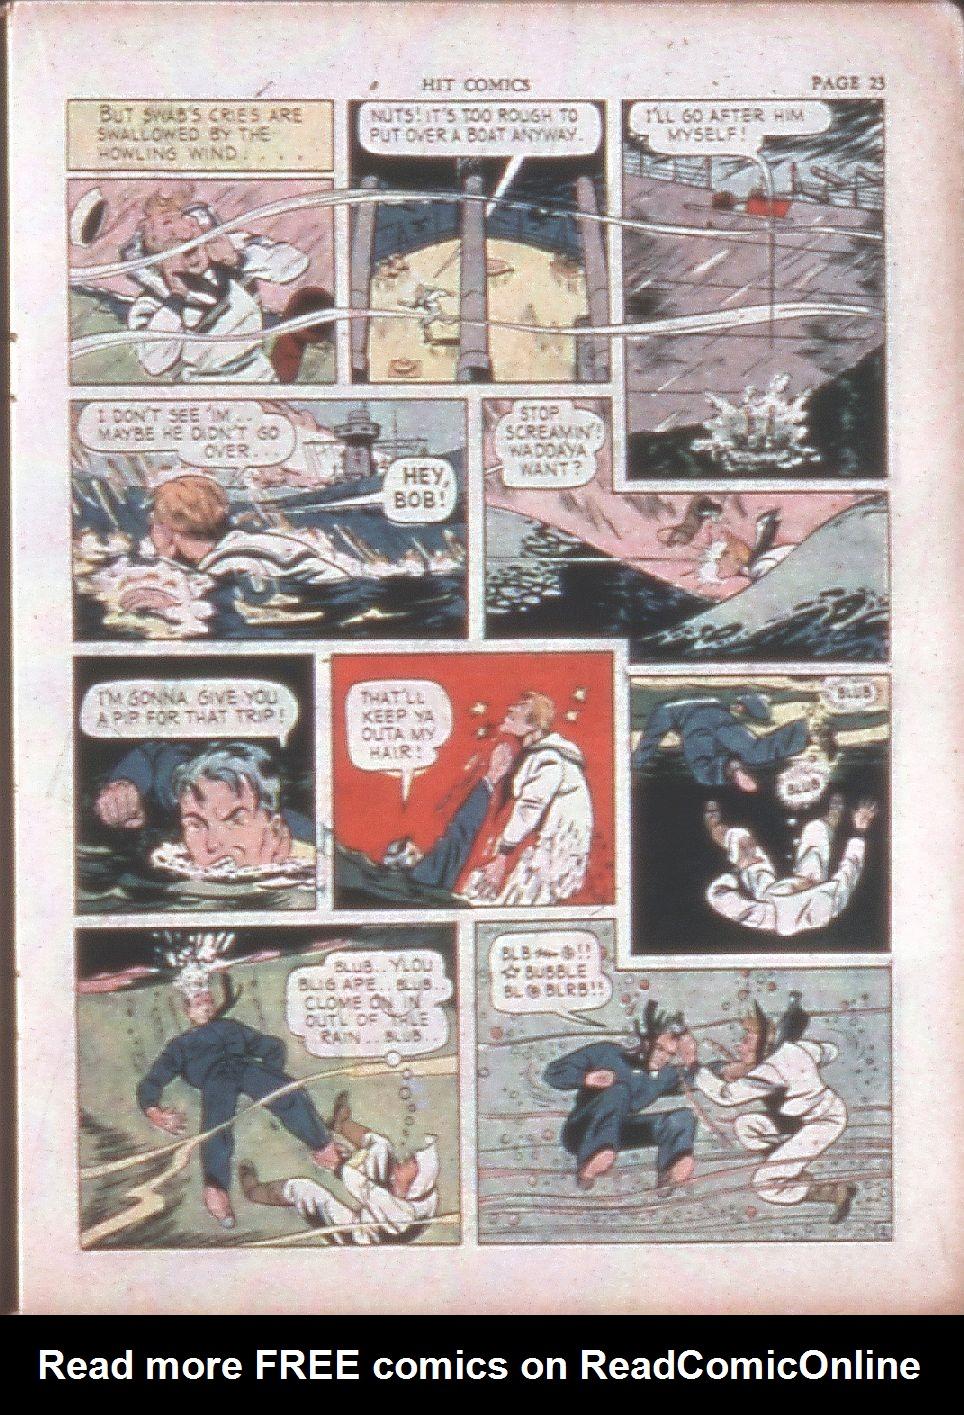 Read online Hit Comics comic -  Issue #15 - 25